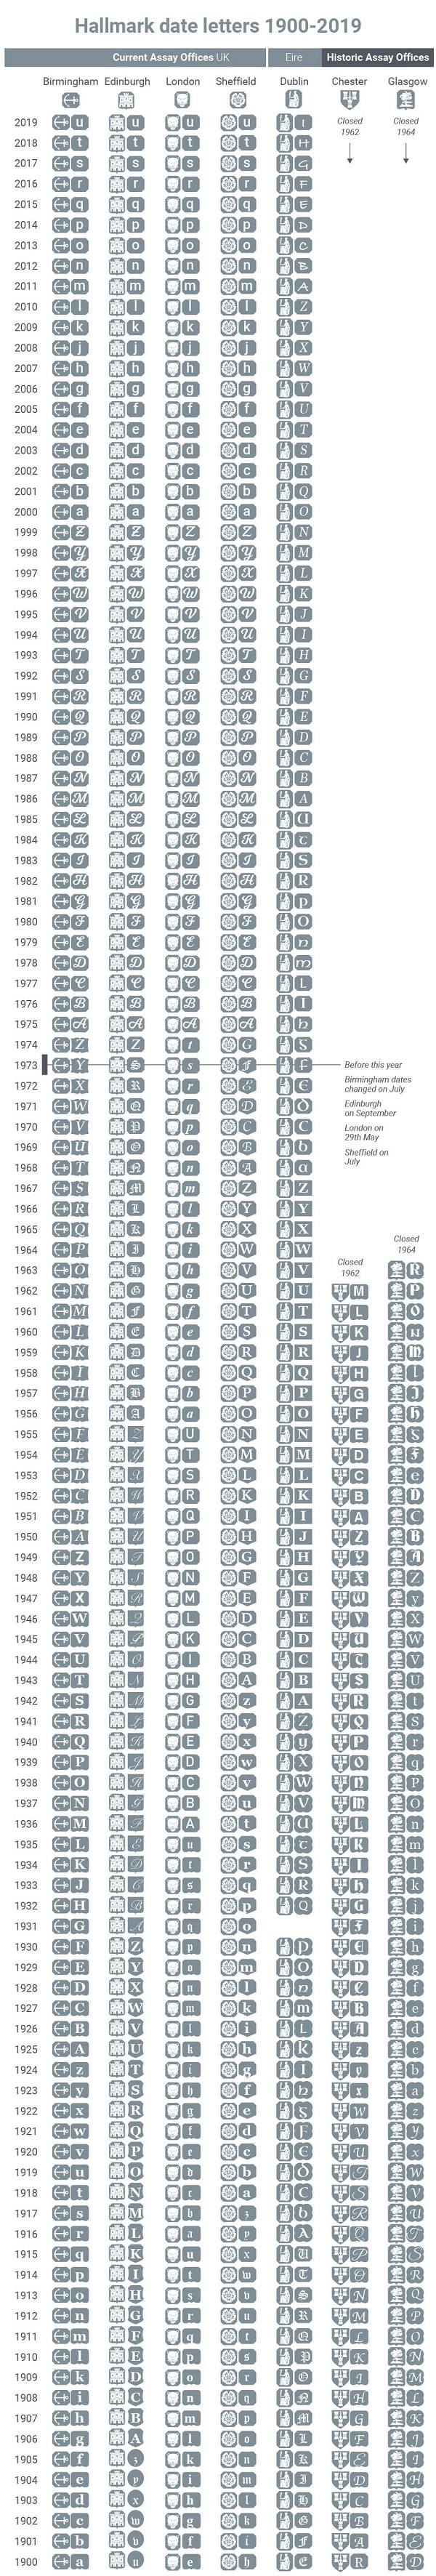 Silver Hallmark date letters 1900 2019